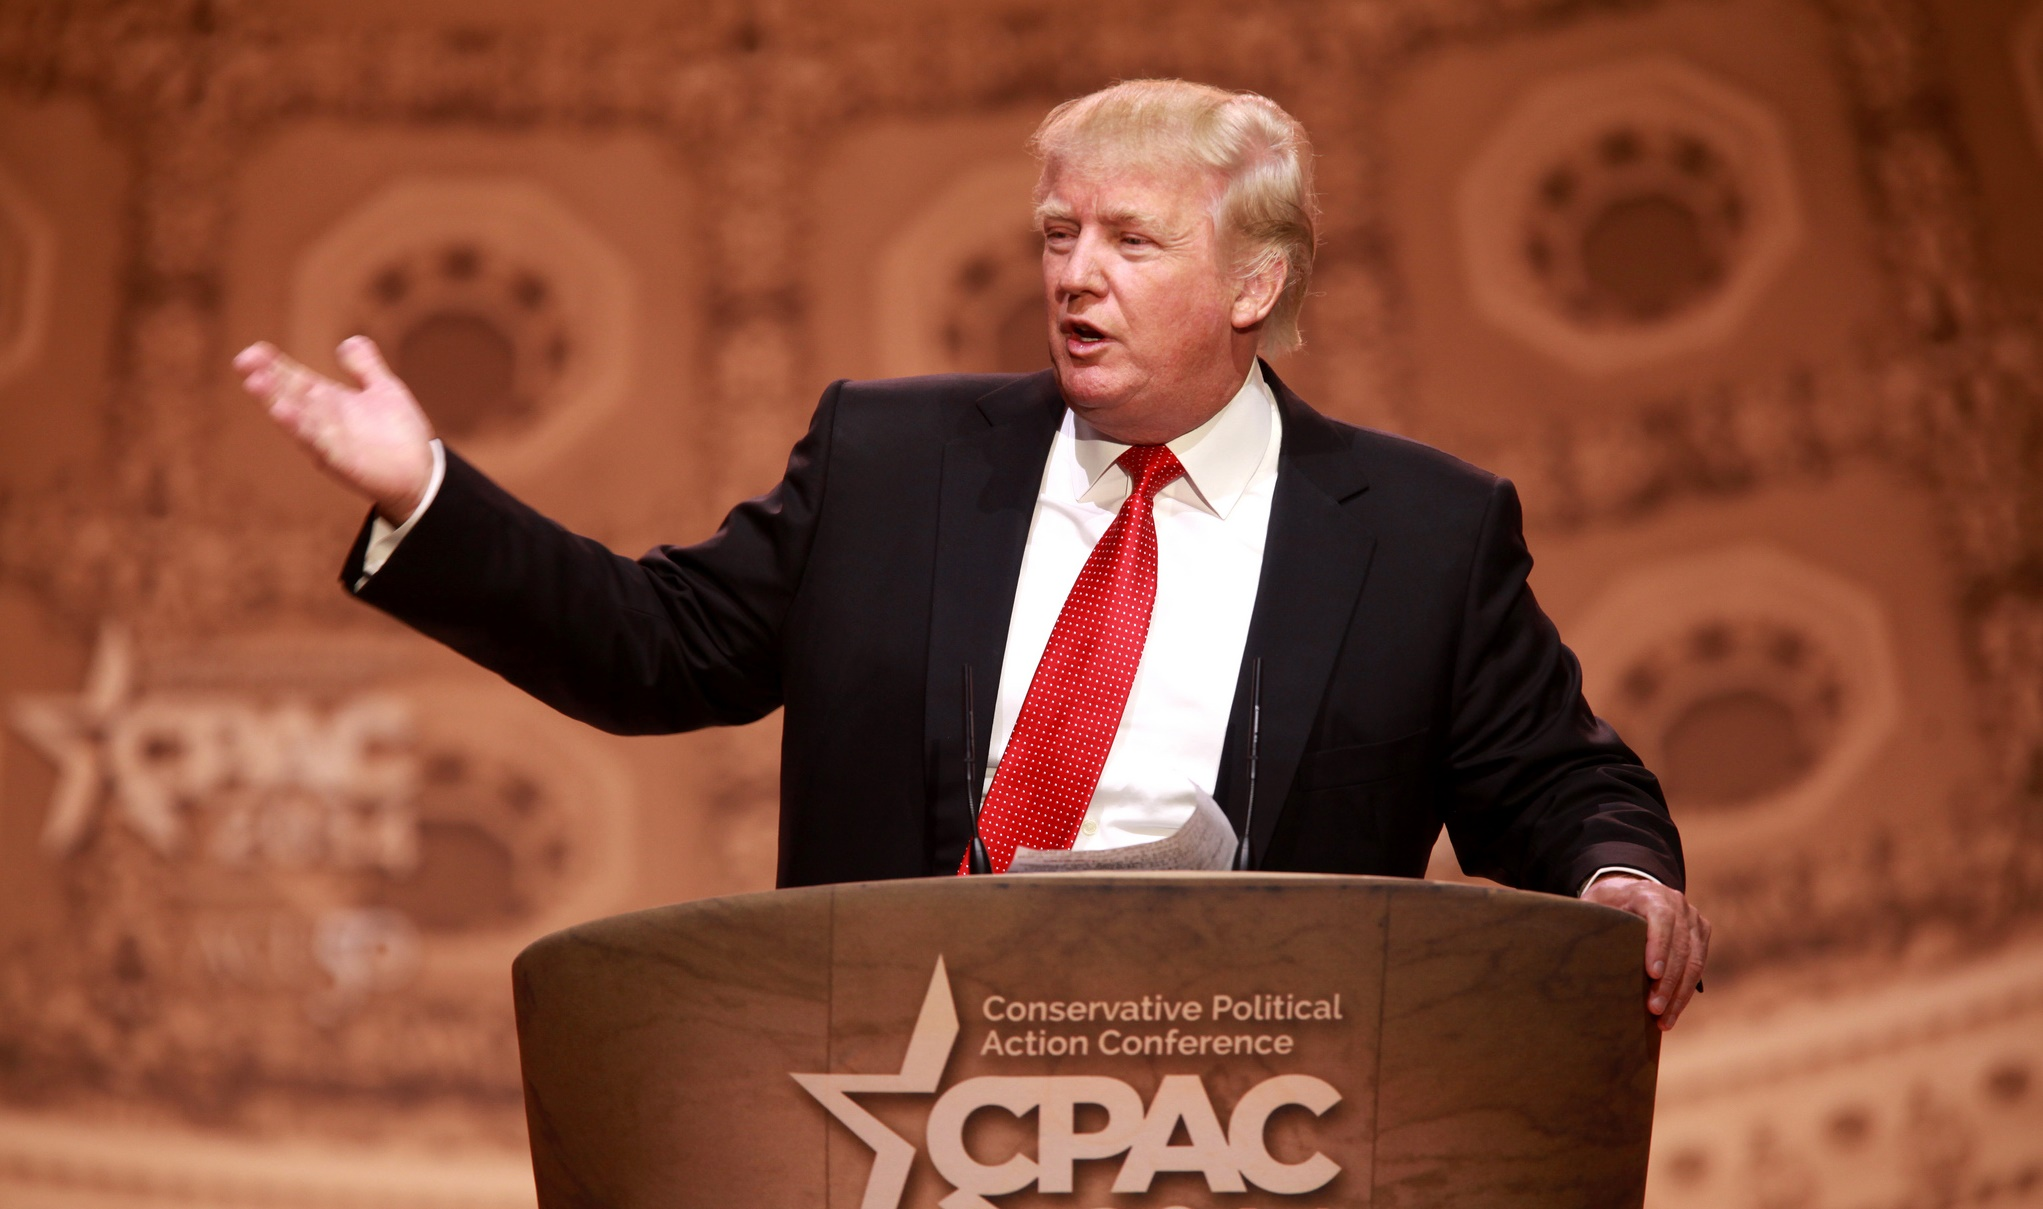 When CPAC Speakers Clash: Donald Trump Takes On Jeb Bush